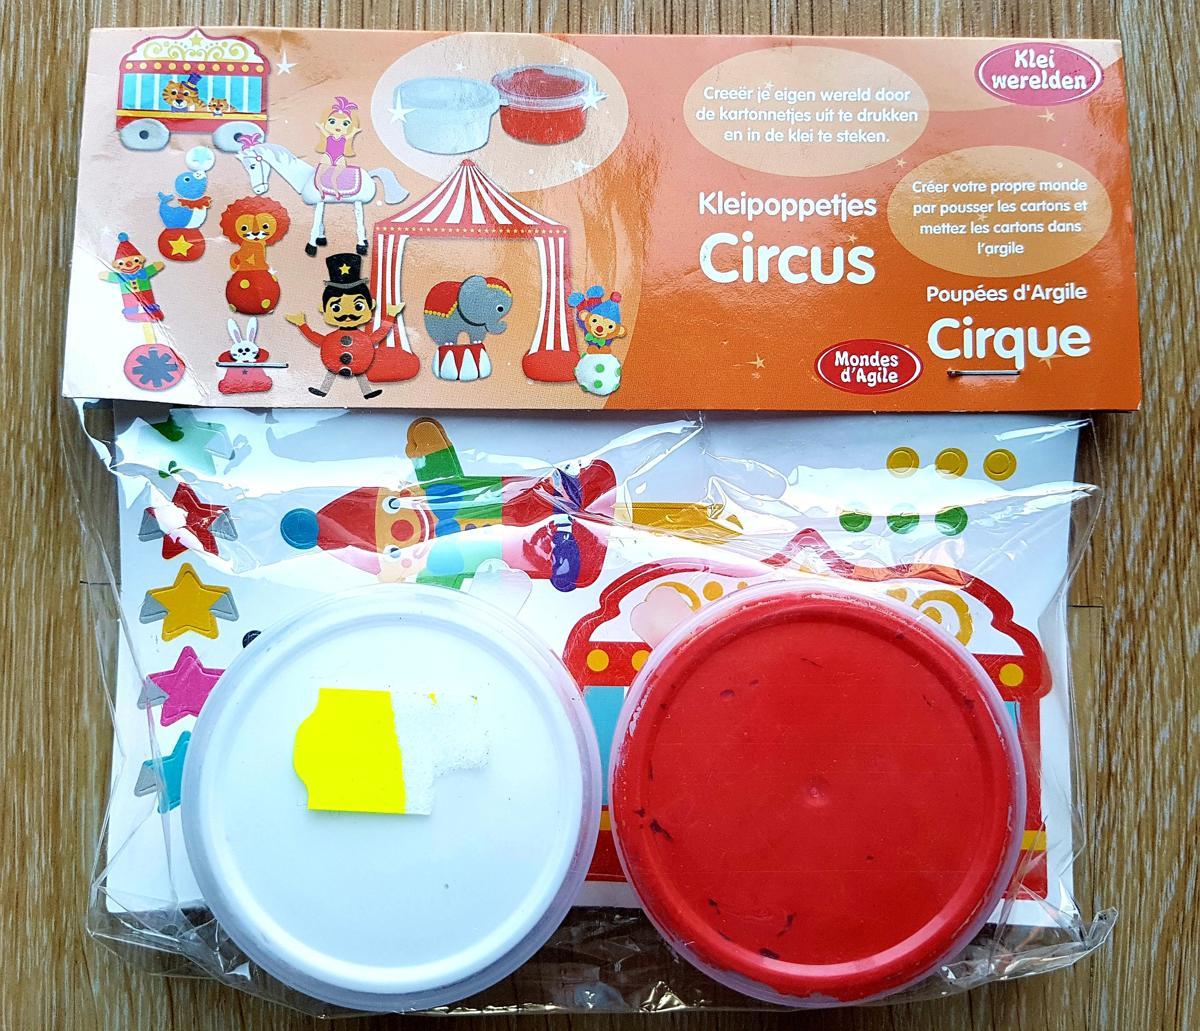 Klei werelden, Klei poppetjes Circus